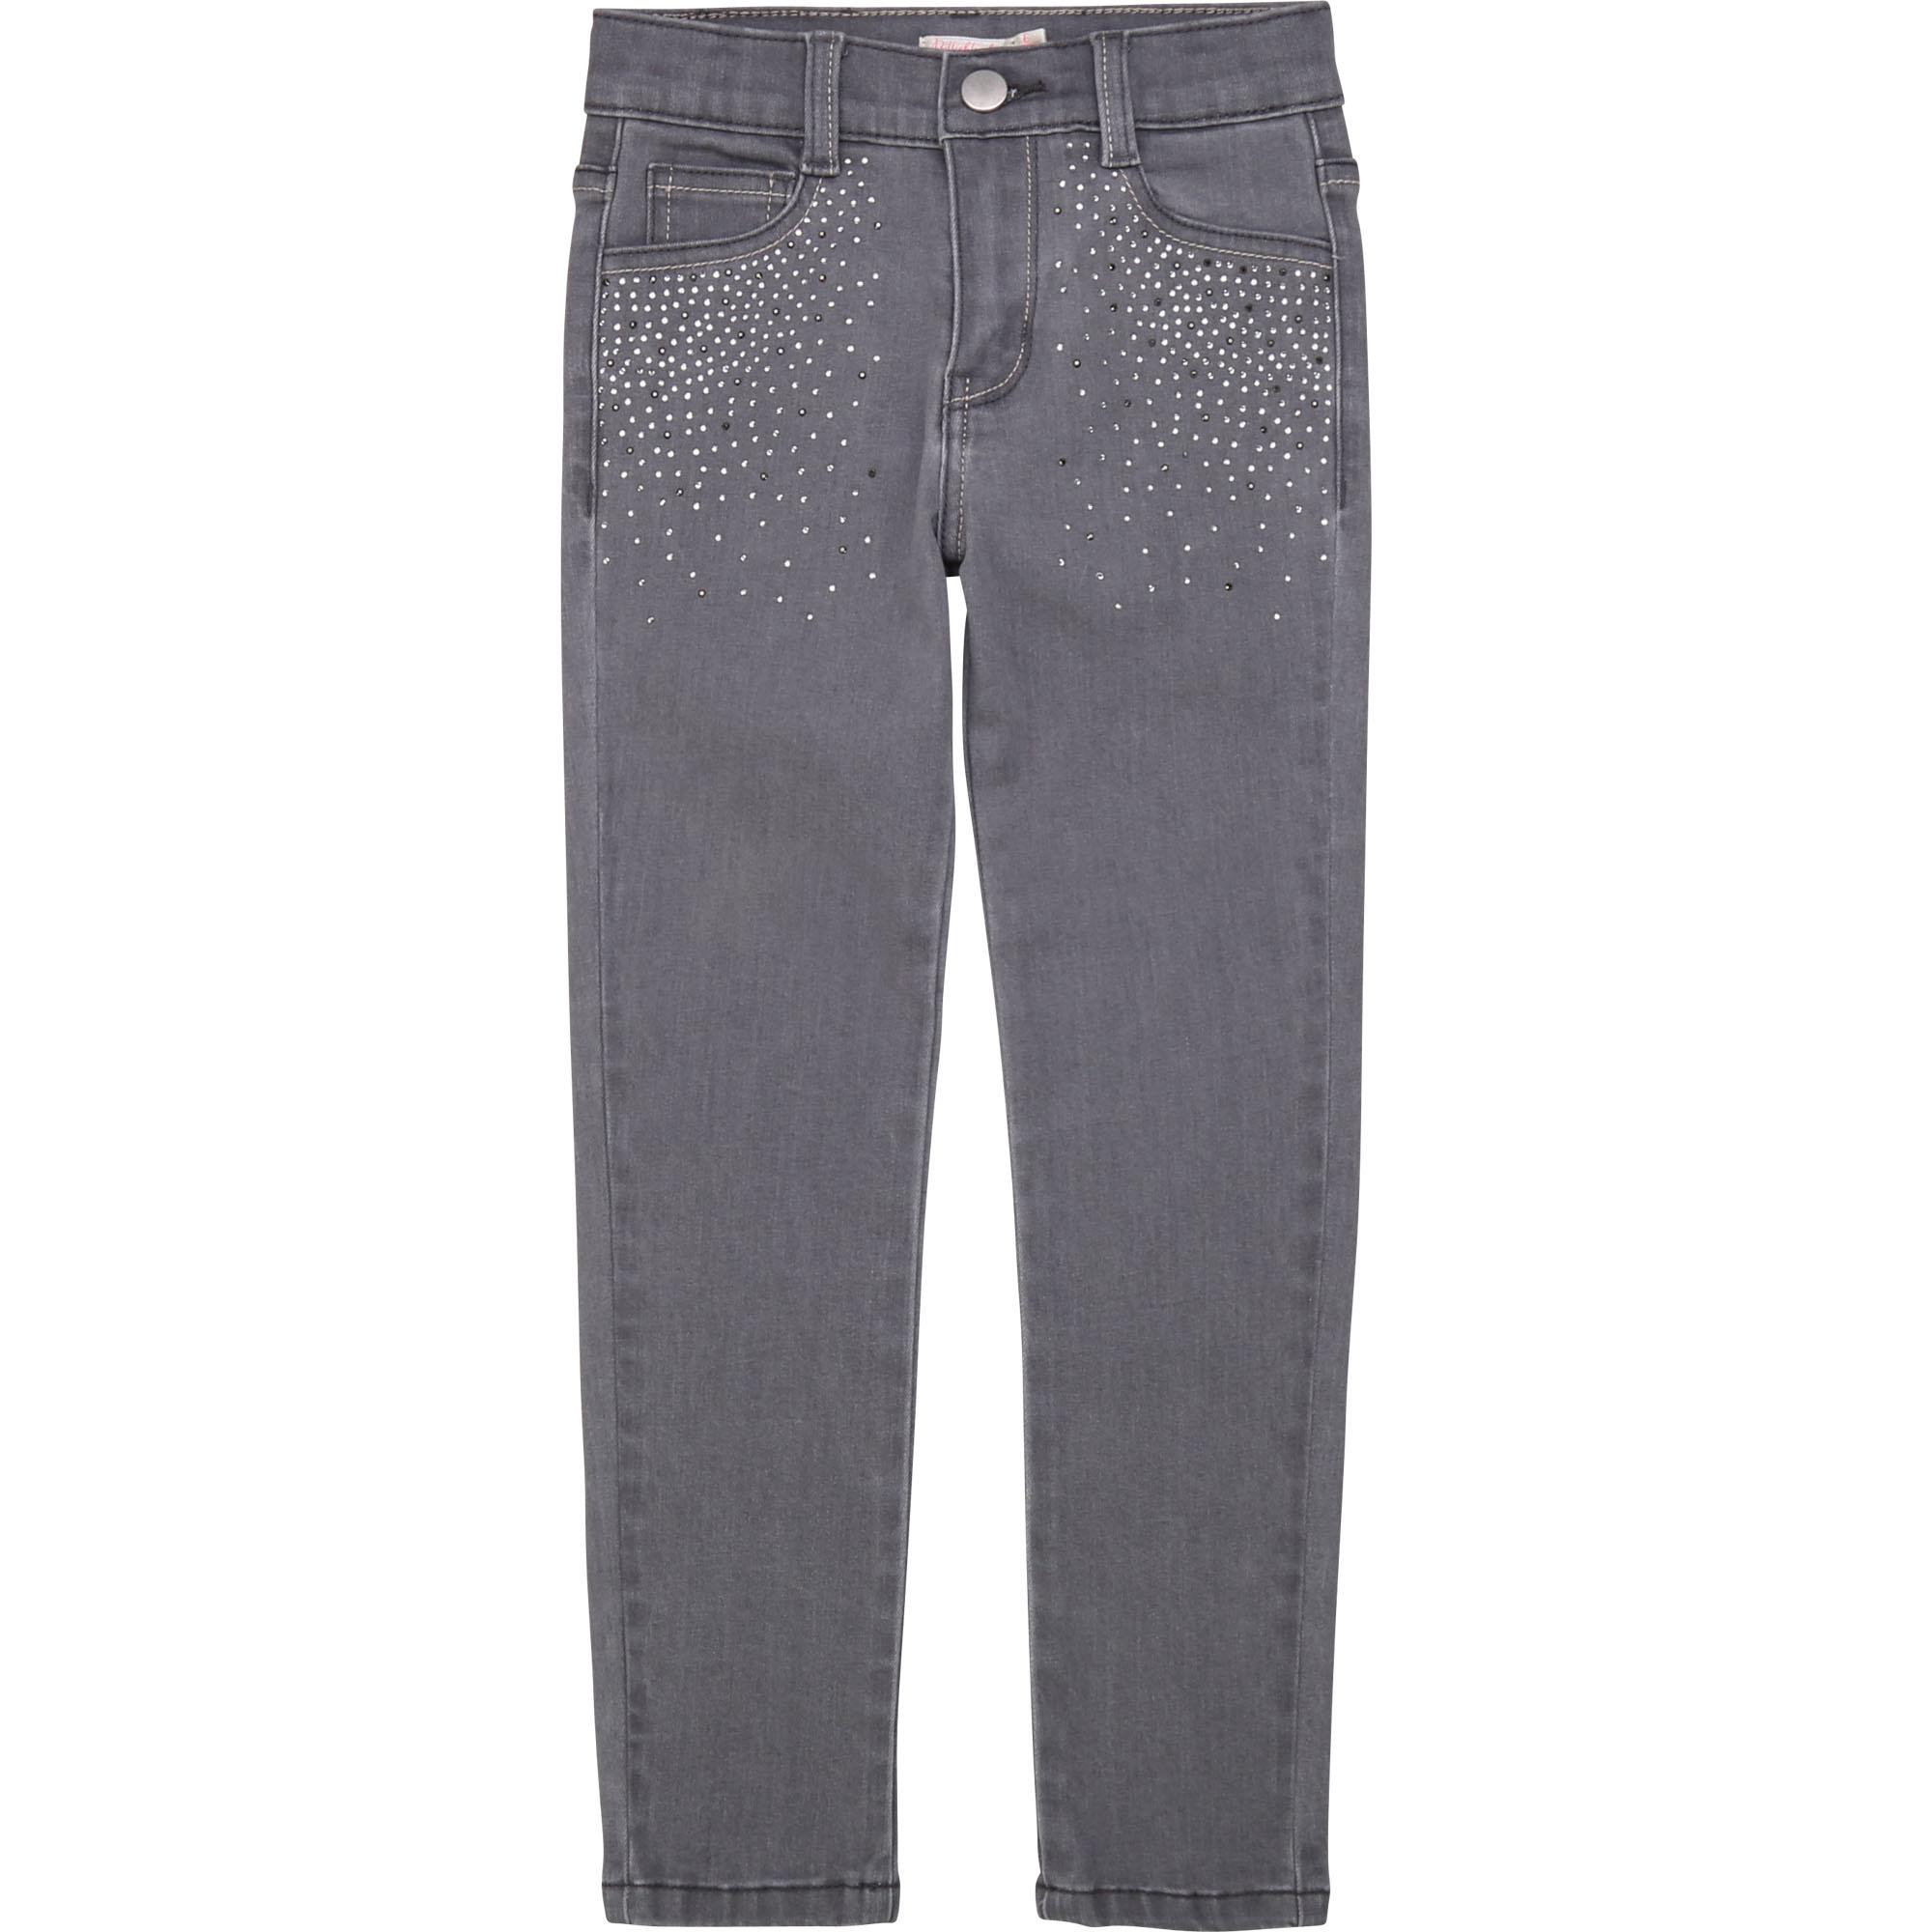 BILLIEBLUSH jeans avec strass-1